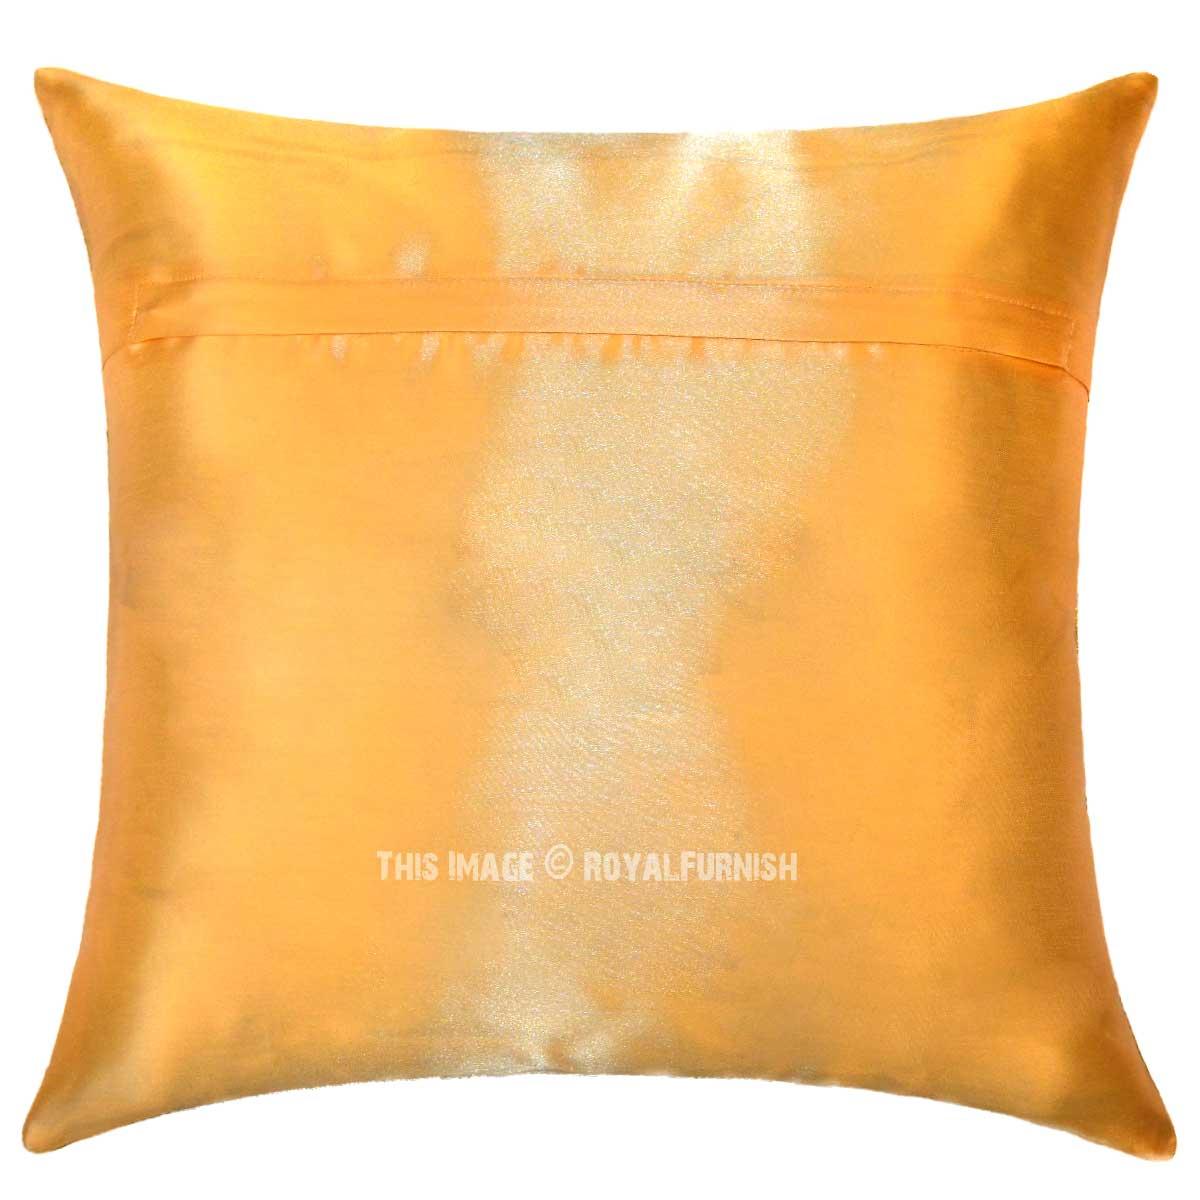 Yellow Silk Throw Pillows : Yellow Indian Elephant Silk Brocade Throw Pillow Cover - RoyalFurnish.com